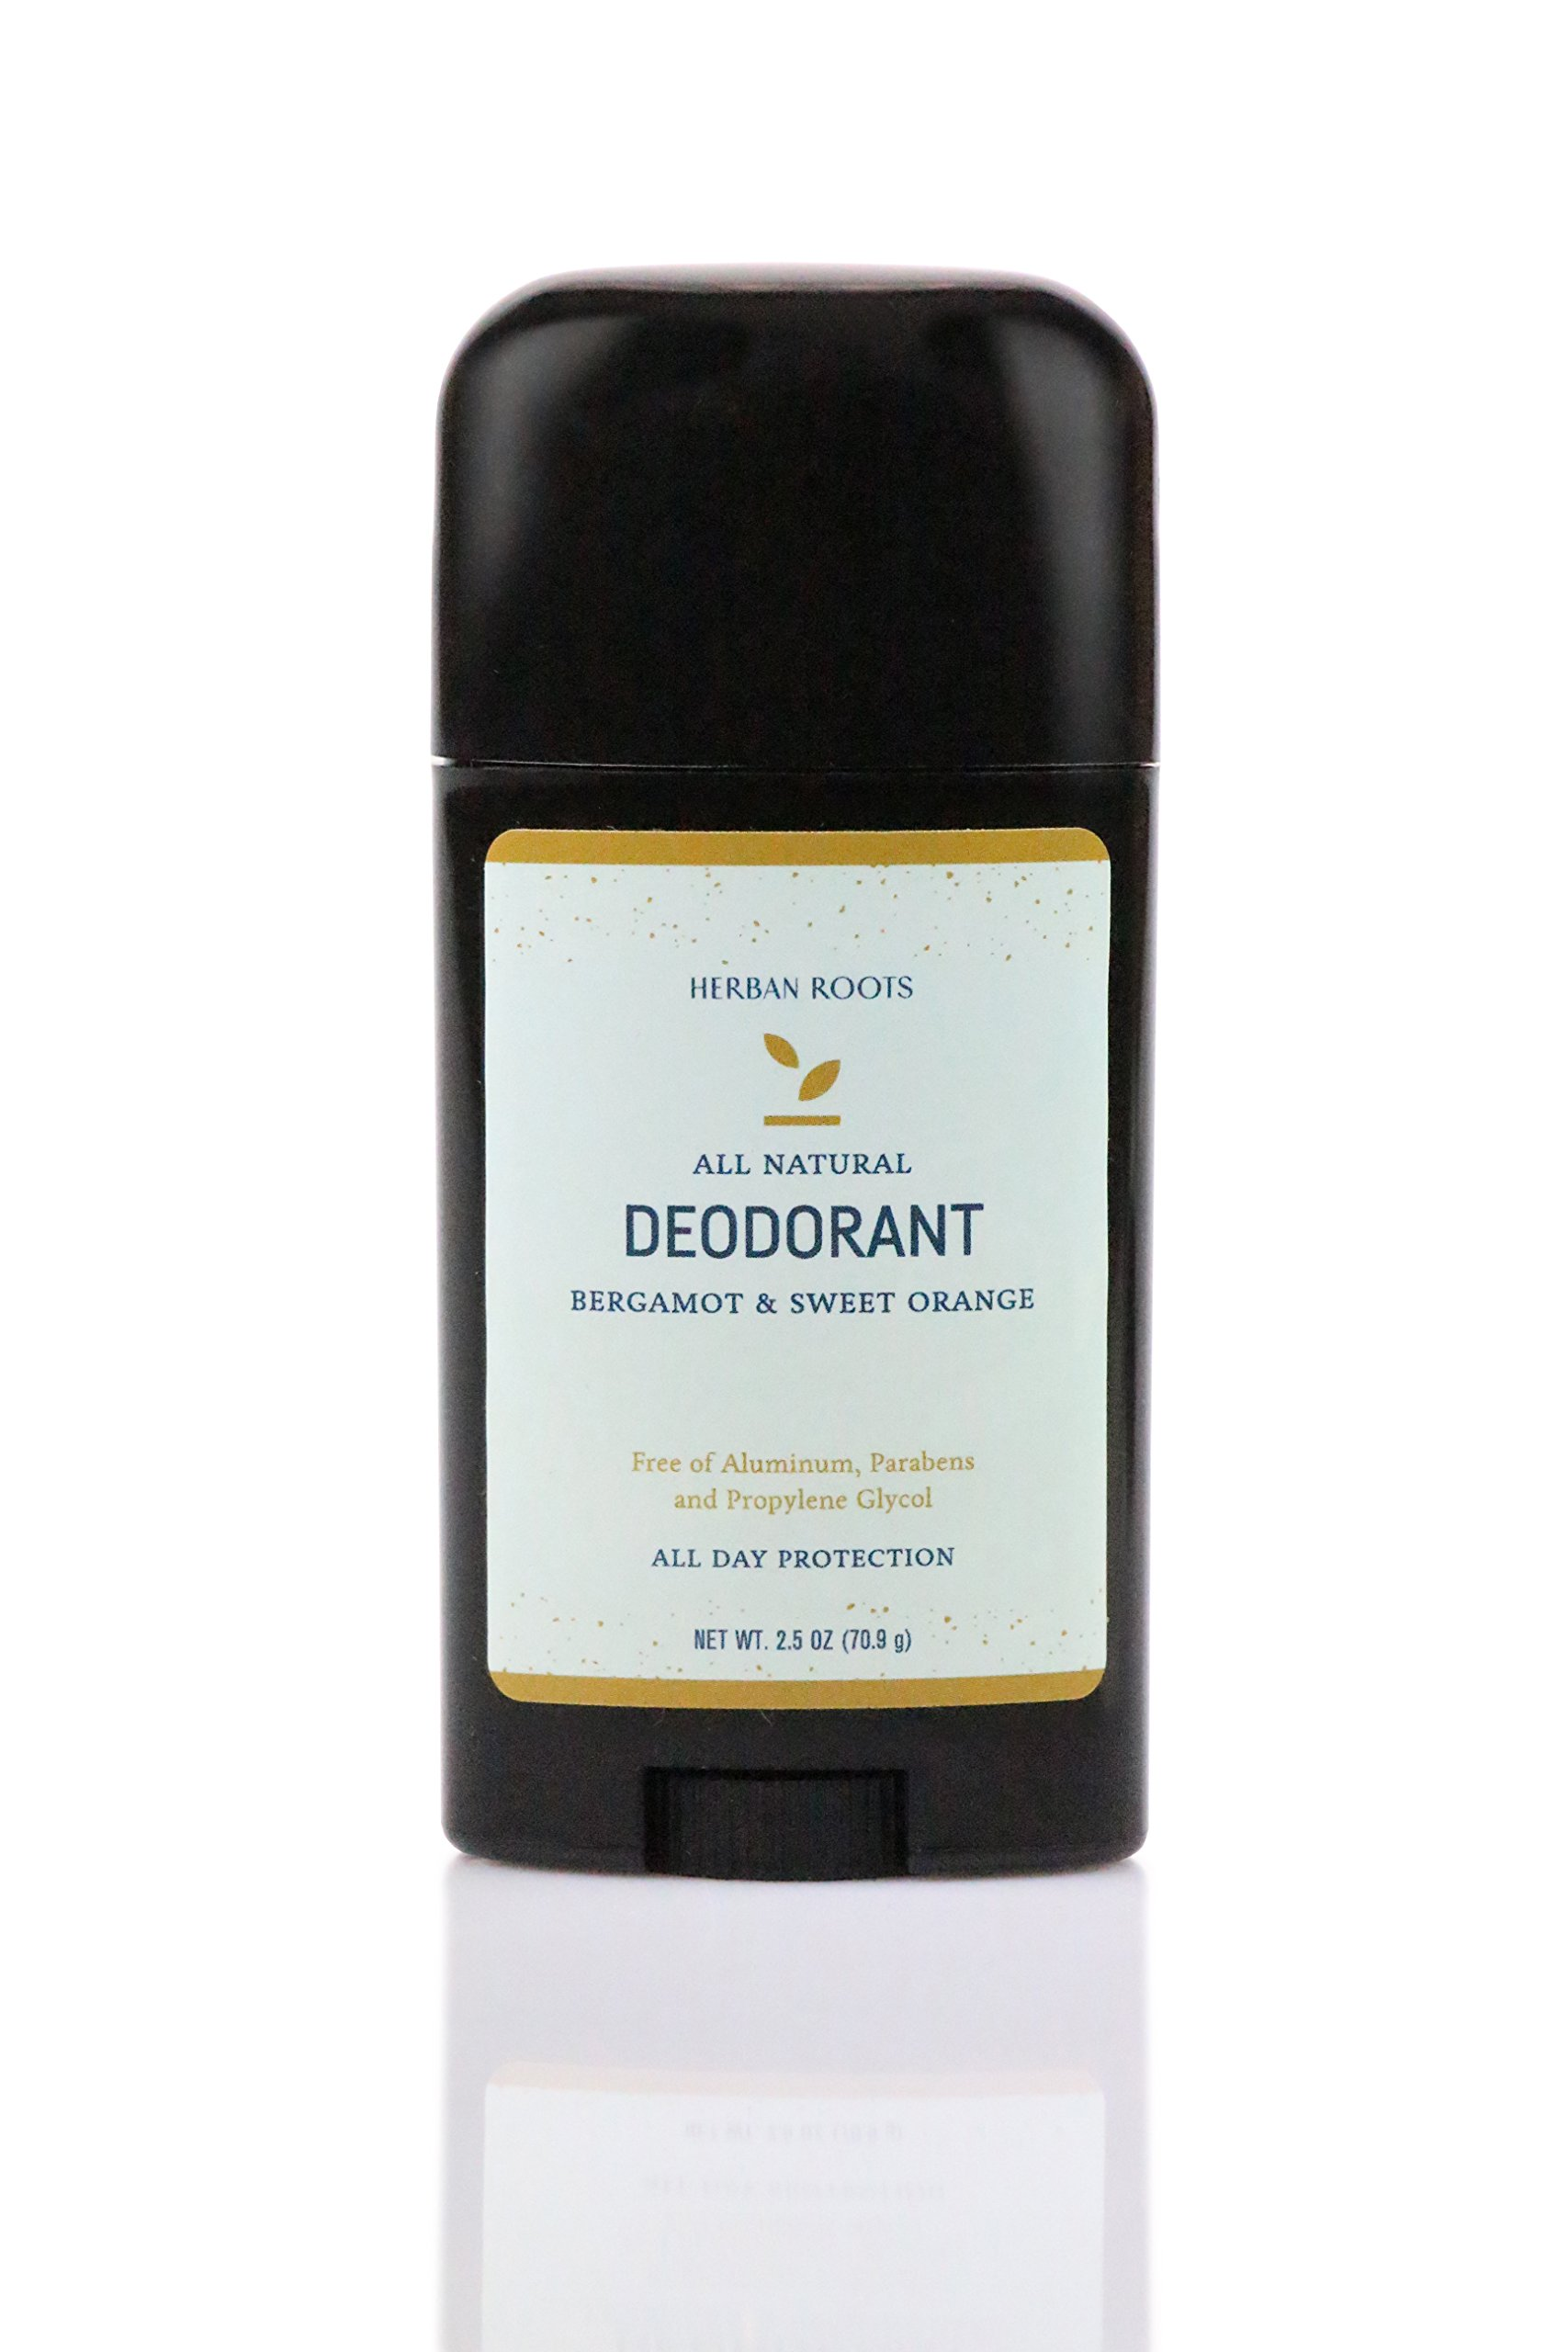 Bergamot & Sweet Orange - Organic Extra Strength Deodorant: Aluminum Free, Natural Ingredients, For Men and Women - Herban Roots